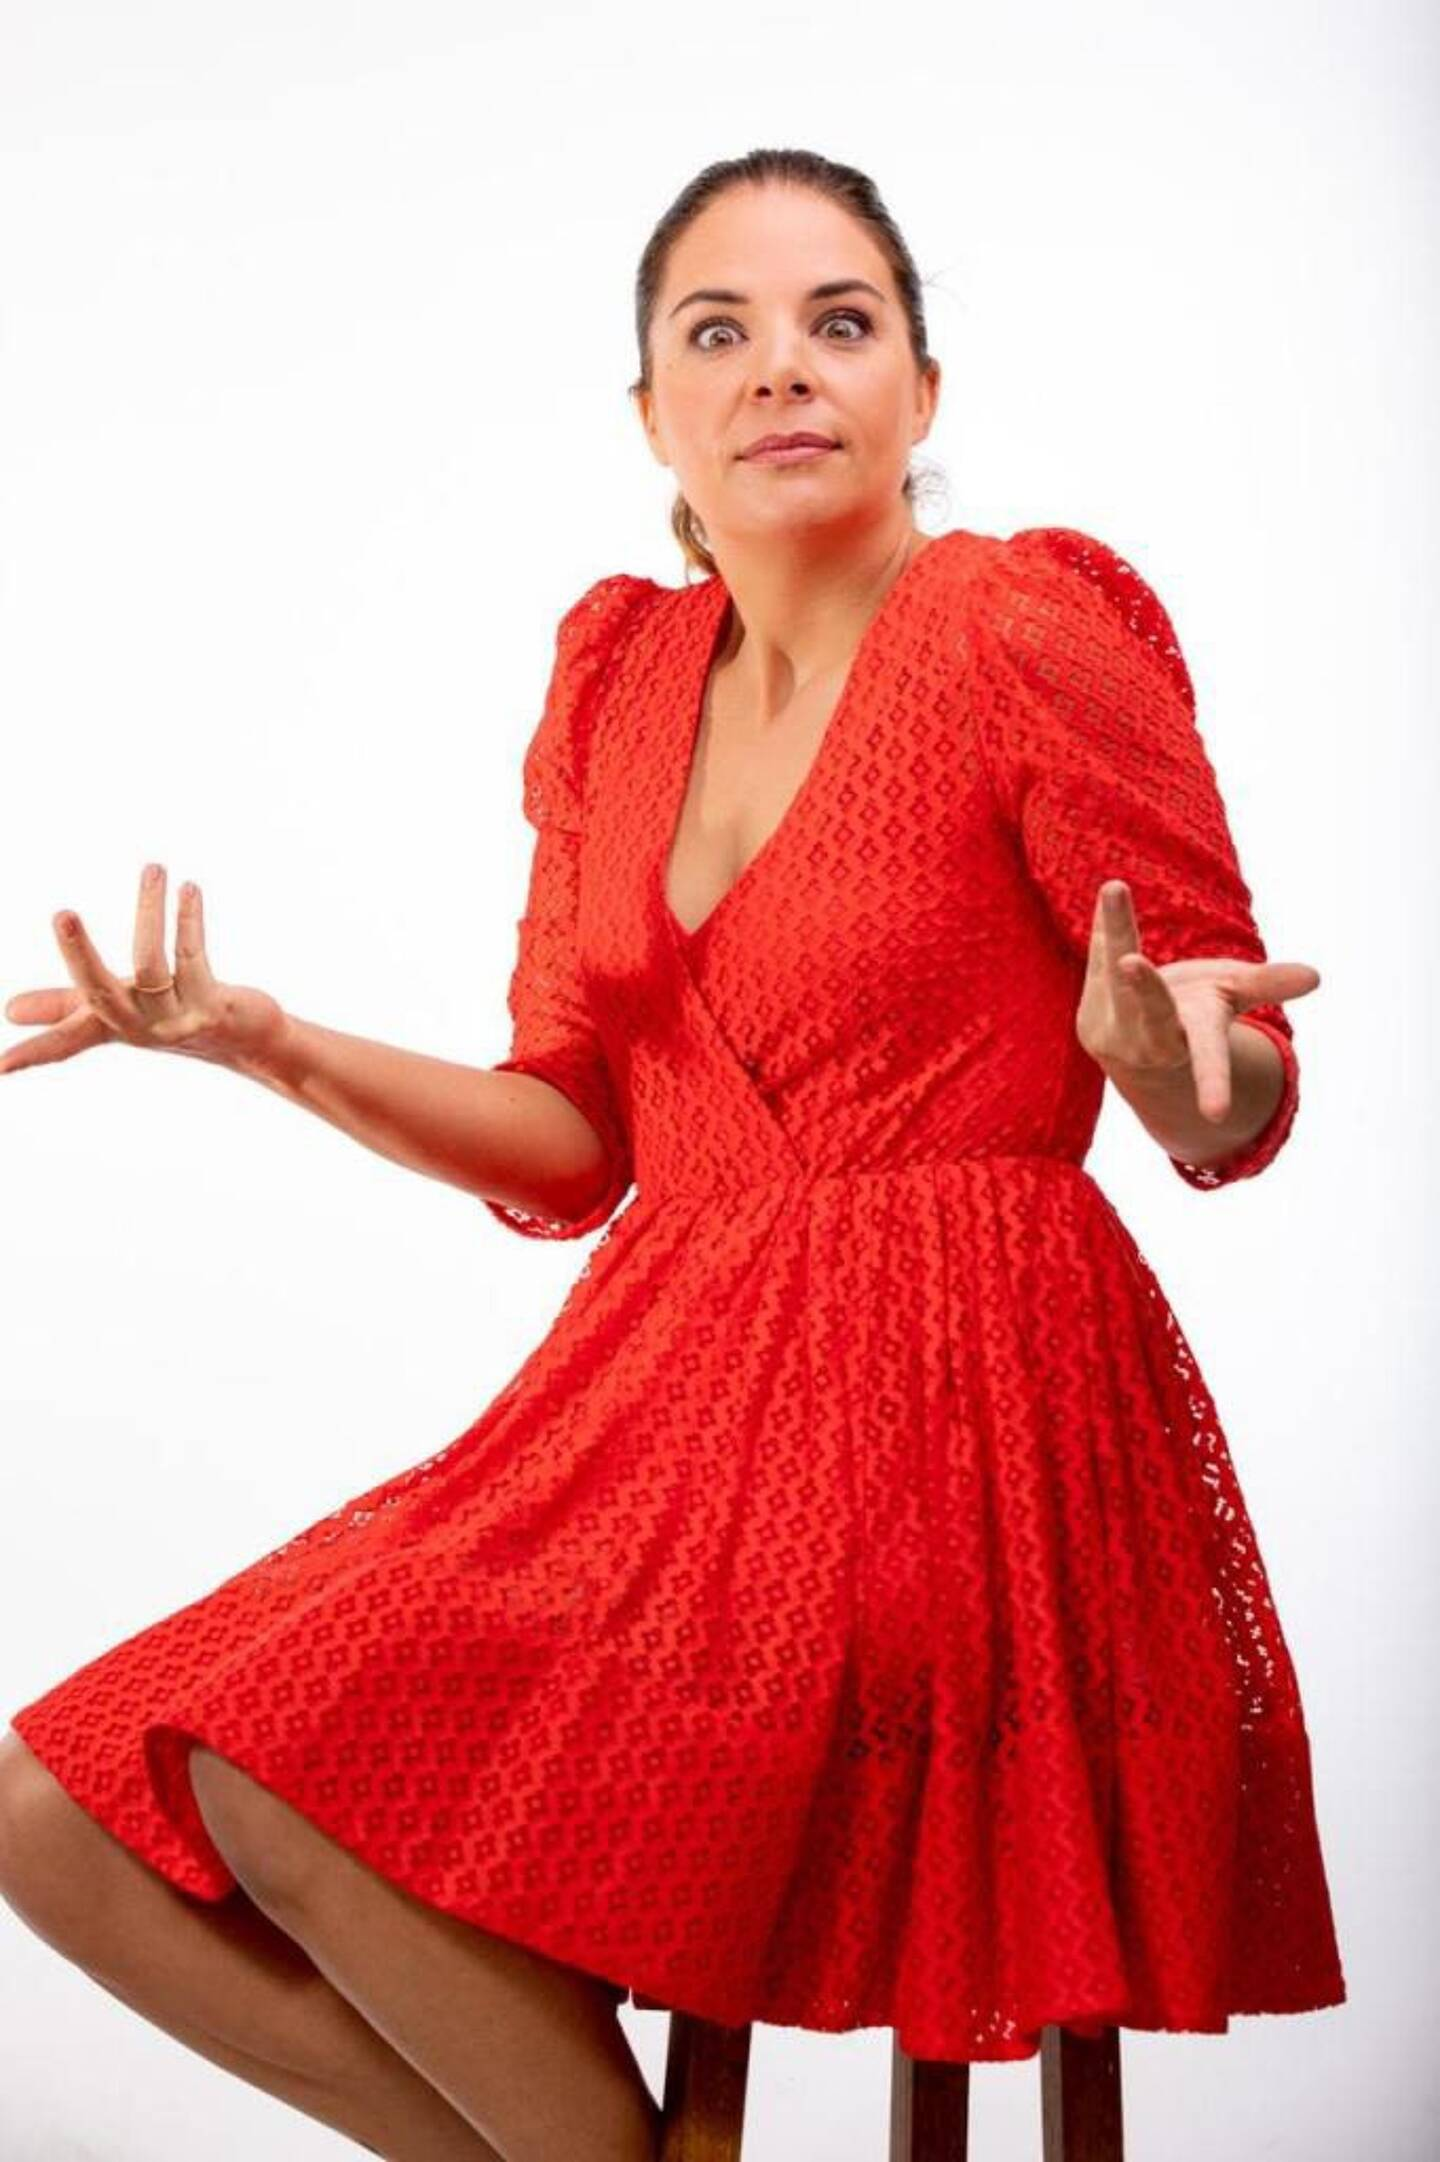 Olivia Correia dans sa robe carmin de La Rouge.